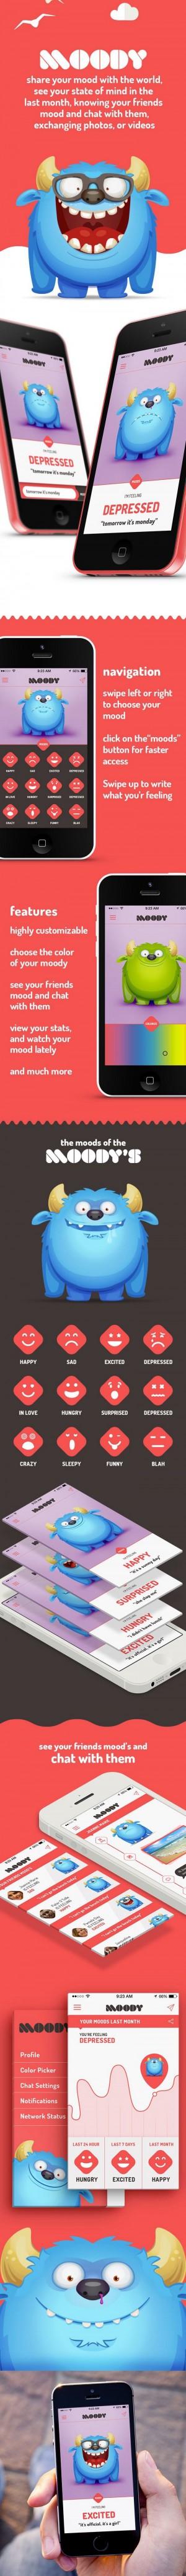 Moody App